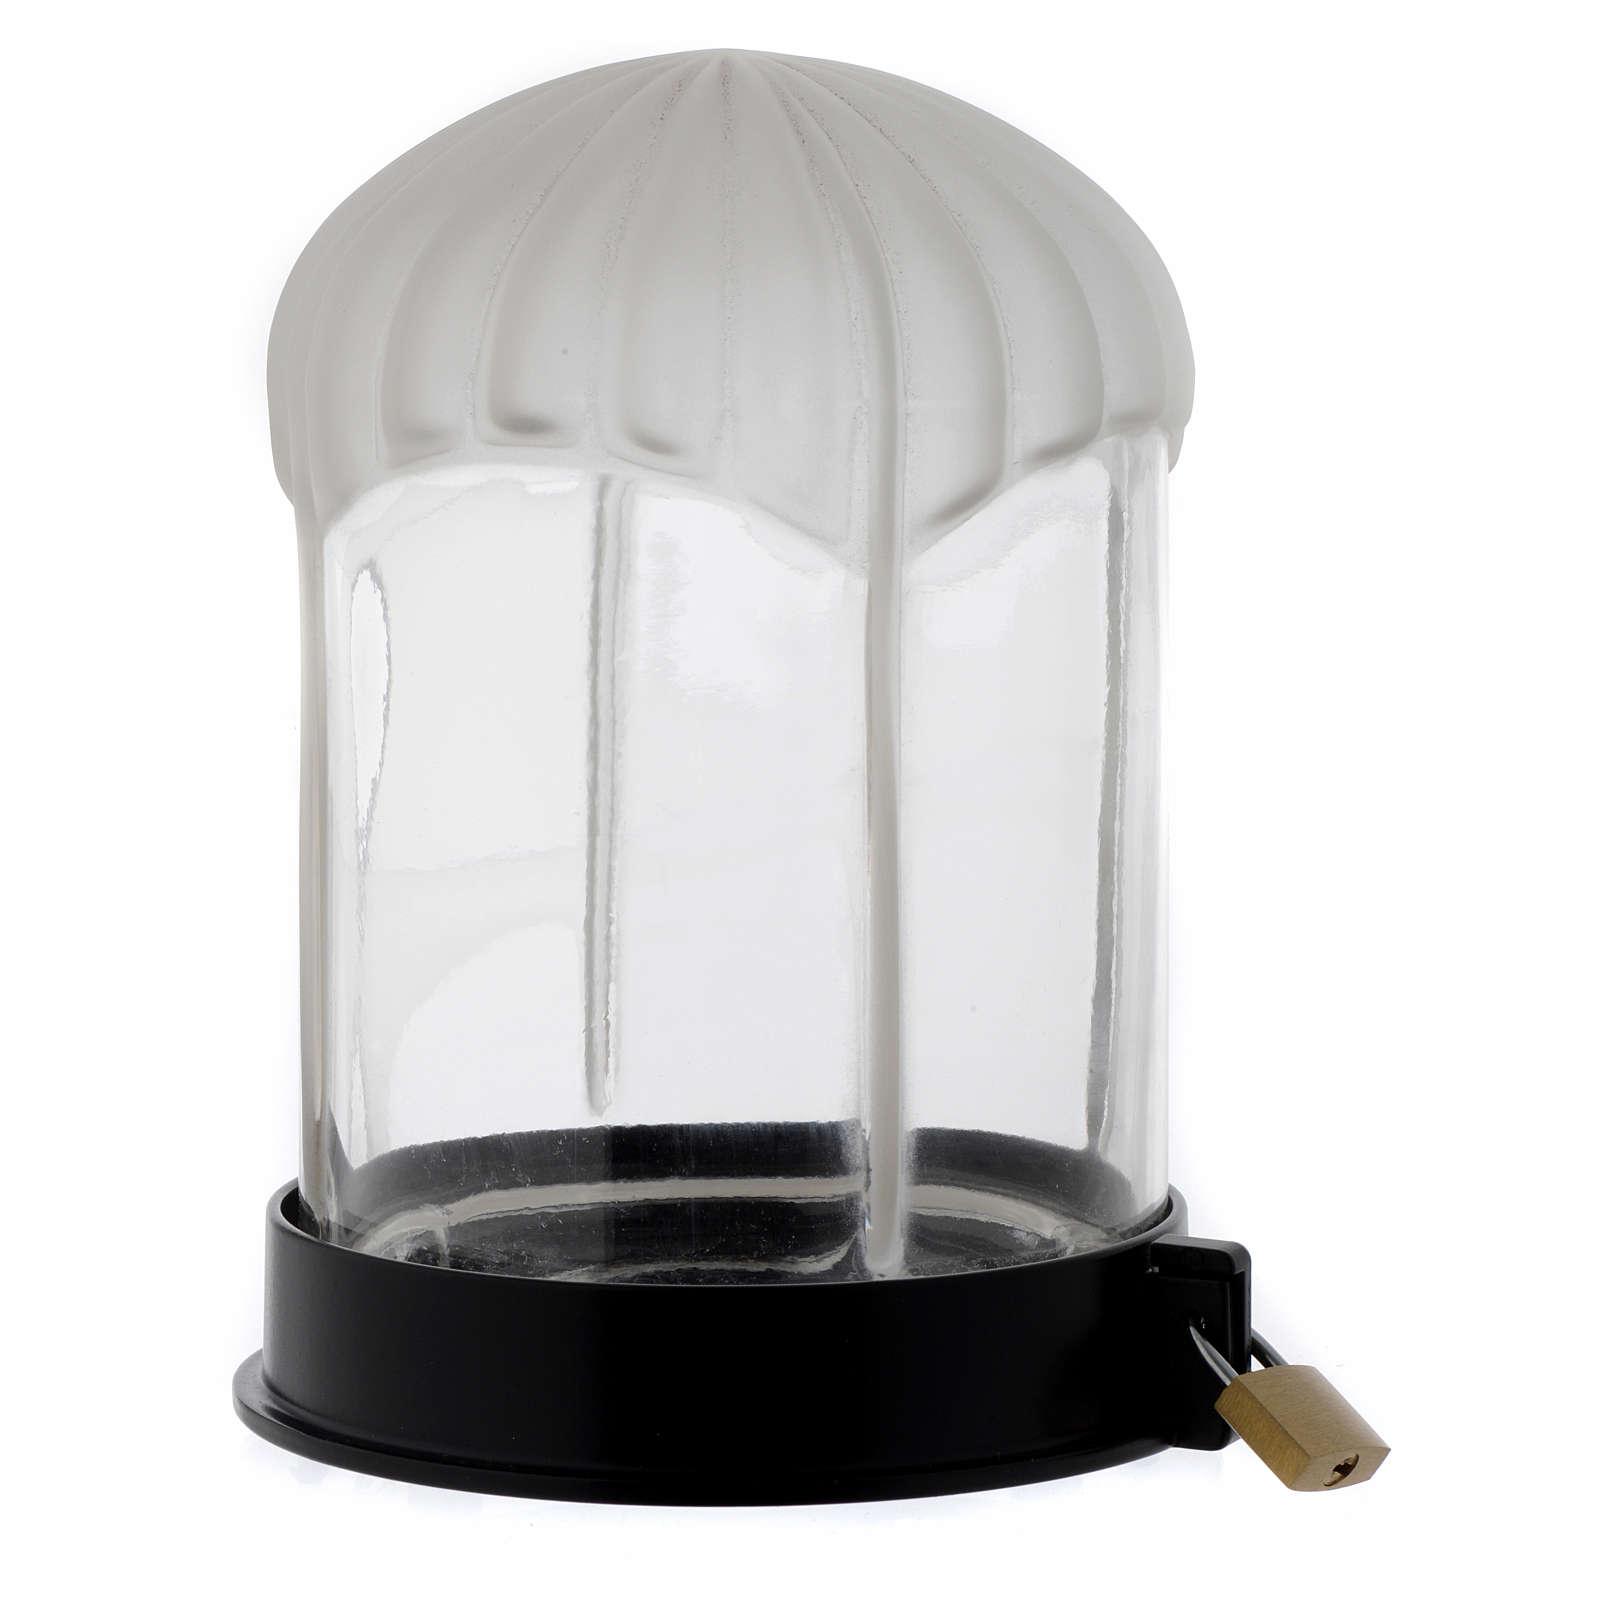 Grave lantern Lumada, black, for electric candle 3